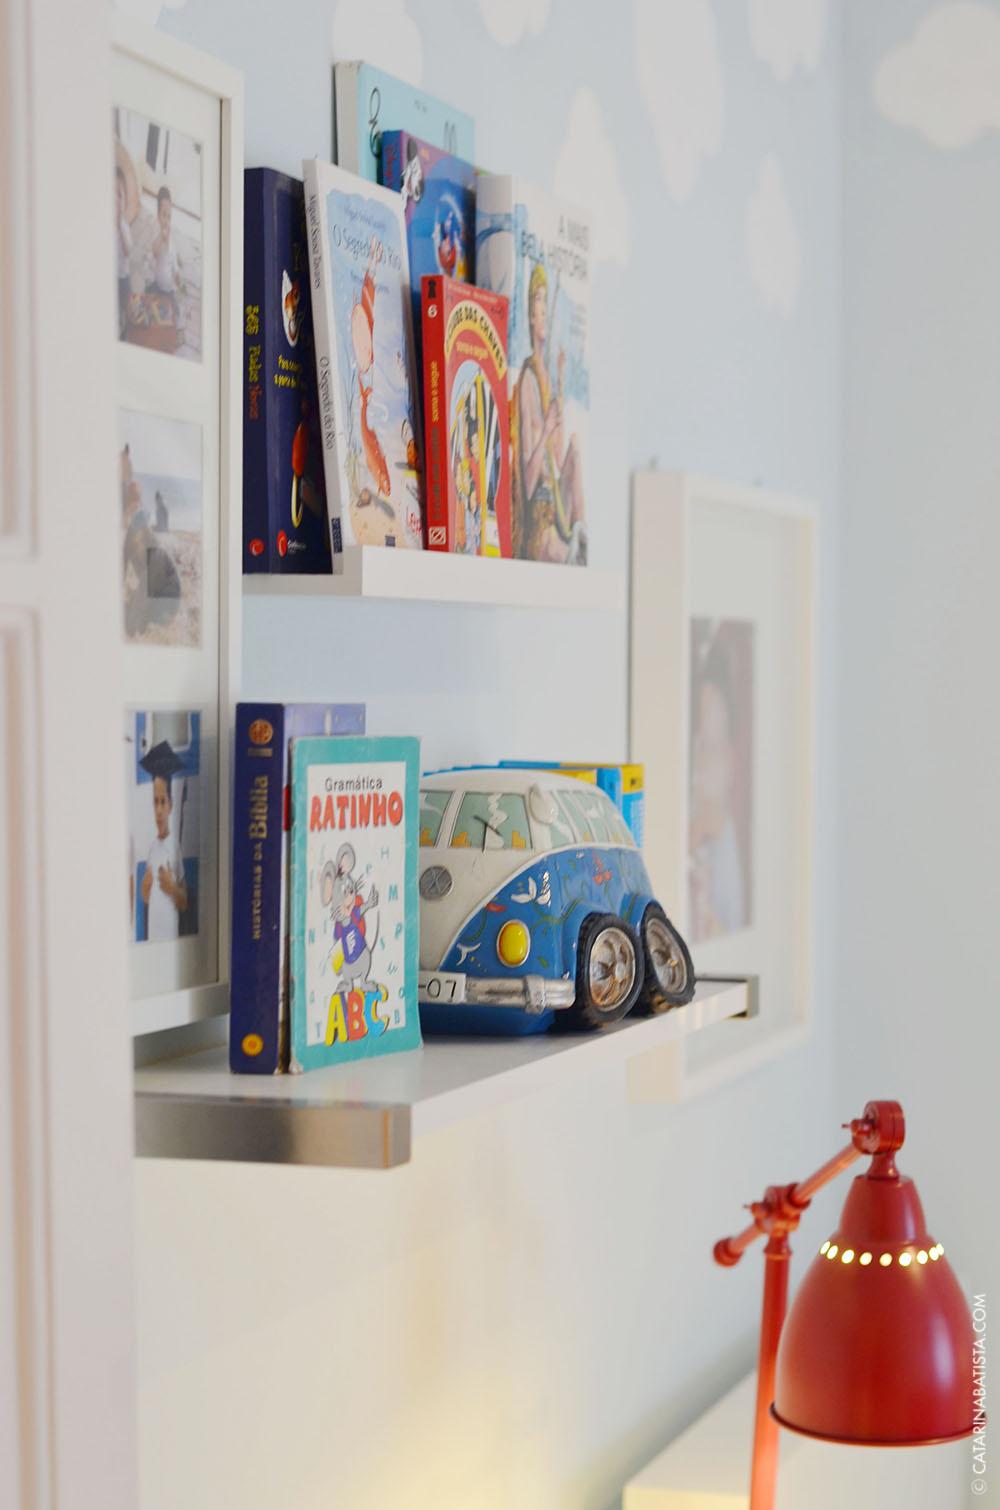 35-catarina-batista-arquitectura-design-interior-decoracao--apartamento-quarto-bedroom-livingroom-sala.jpg